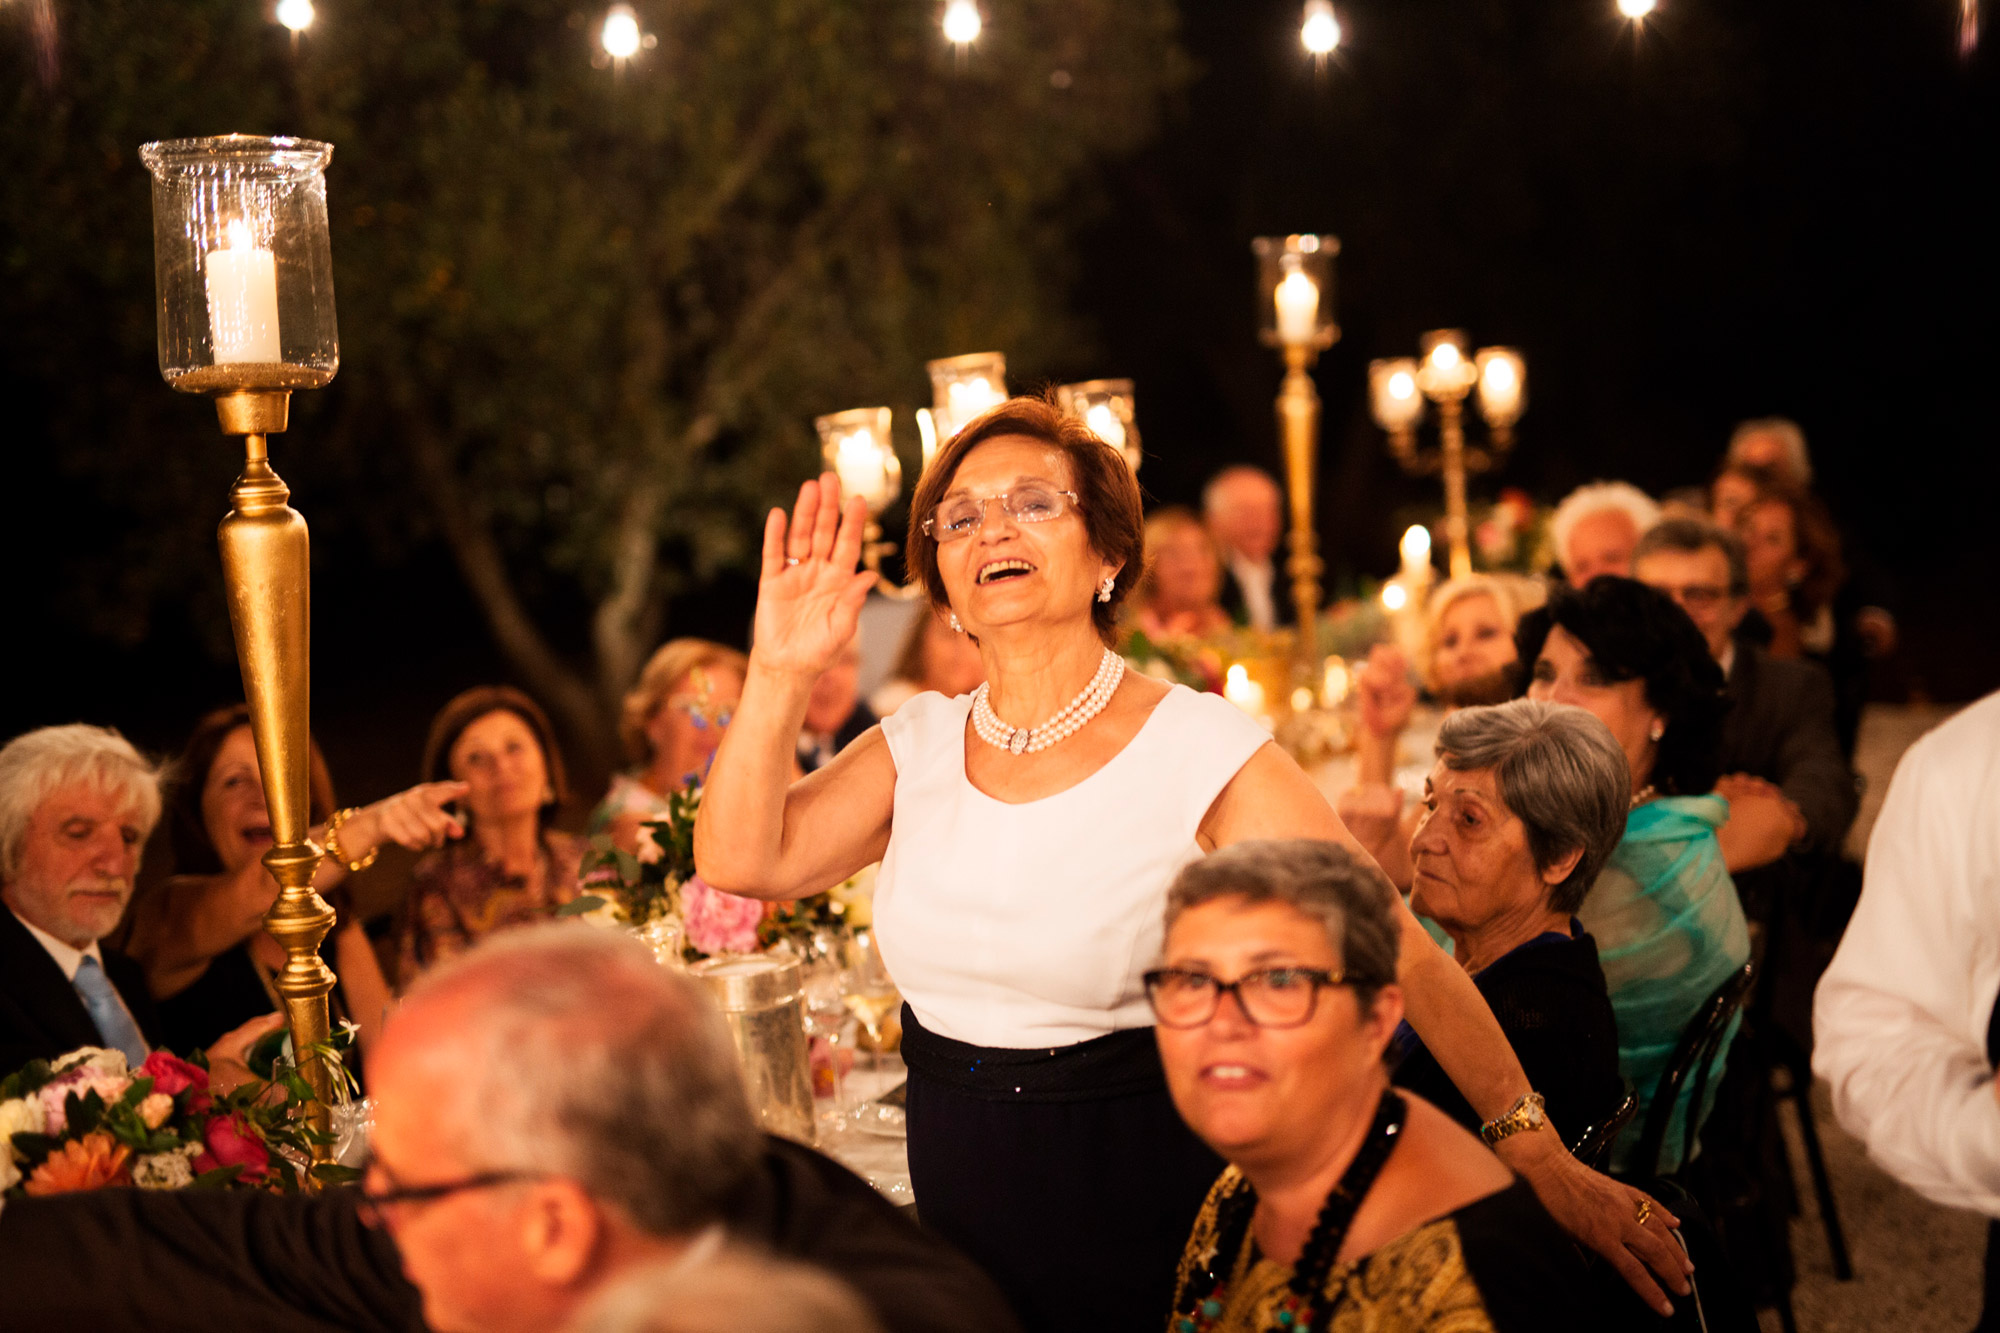 252-FIKUS-PUGLIA-wedding-ostuni-masseria.jpg